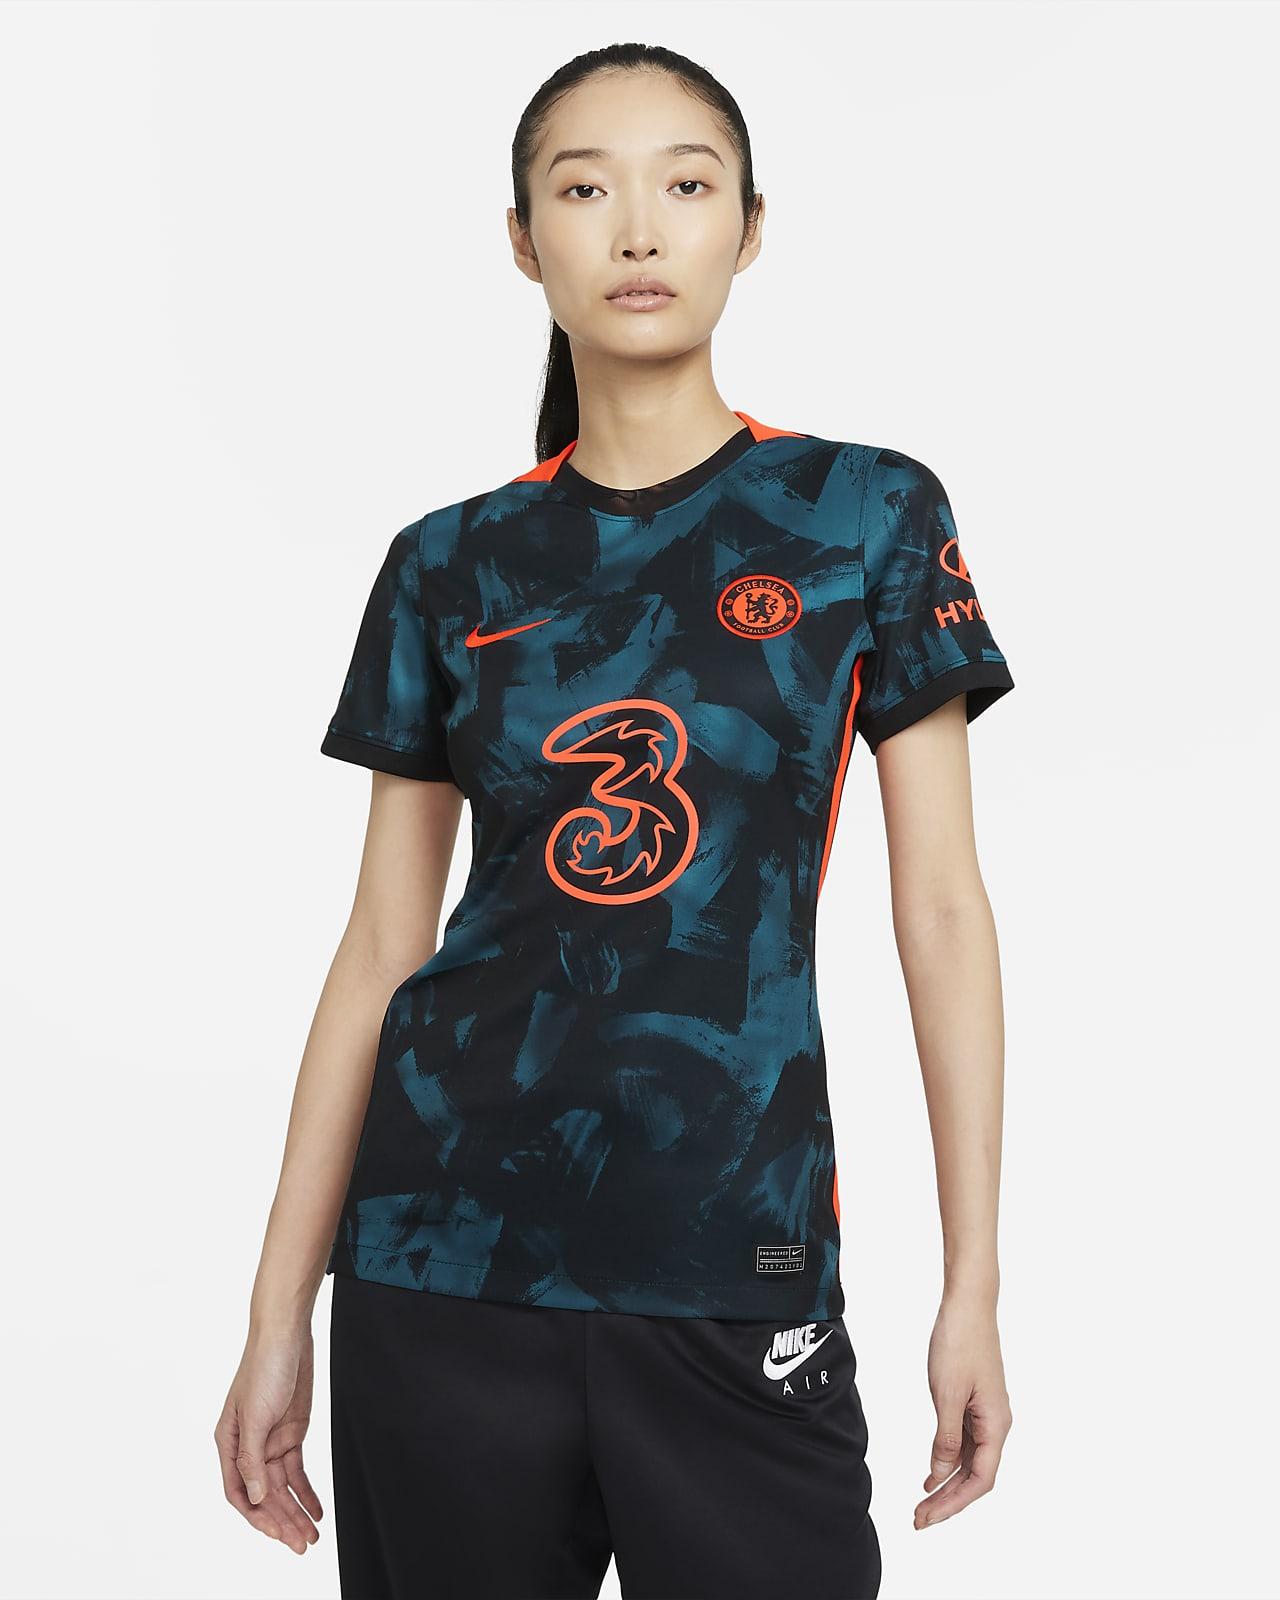 Chelsea FC 2021/22 Stadium (tredjedrakt) Nike Dri-FIT fotballdrakt til dame